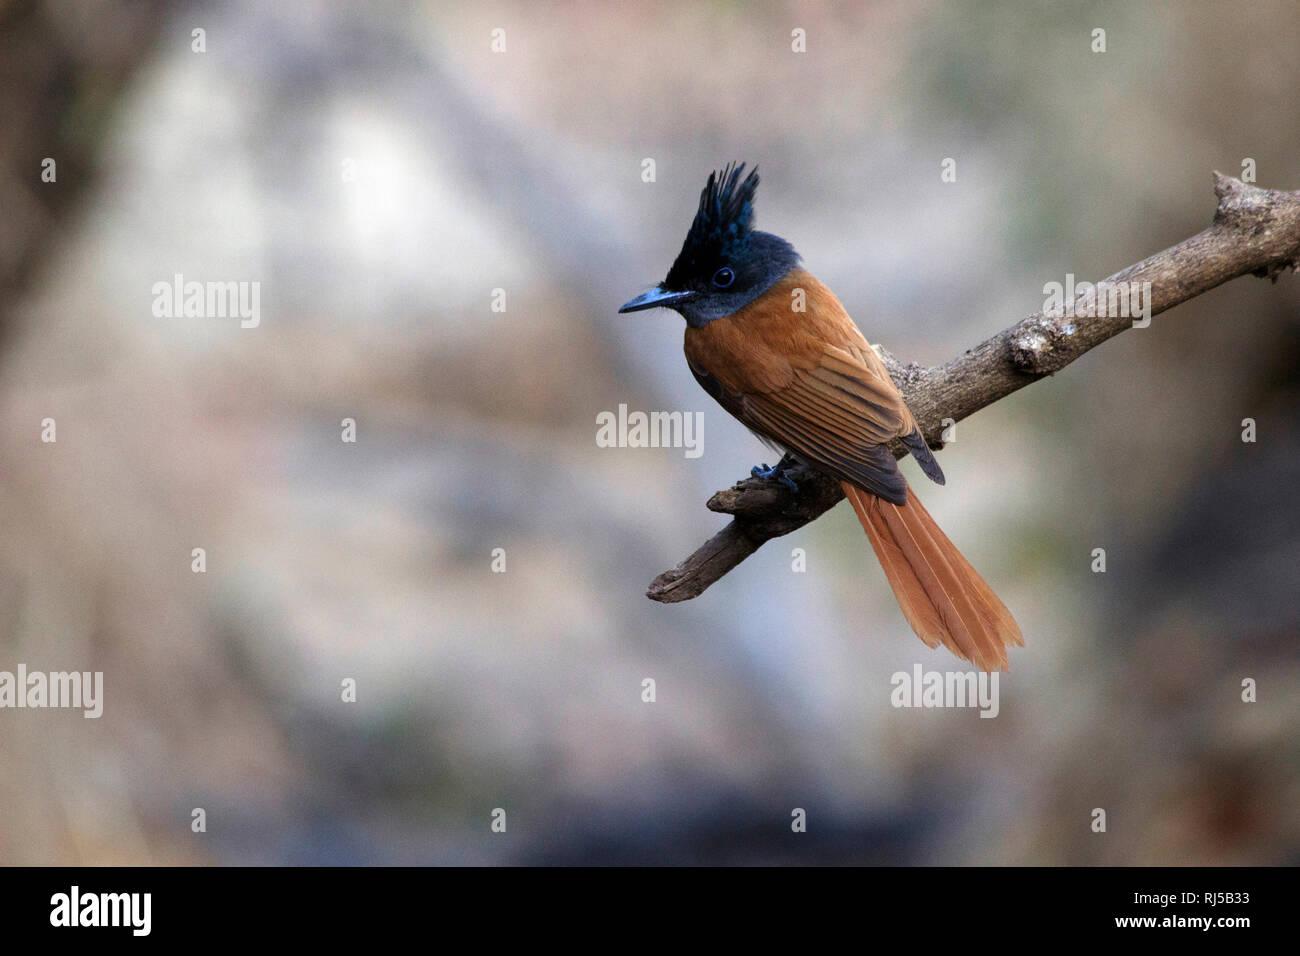 Indian paradise flycatcher, Terpsiphone paradisi, Sinhagad valley, Pune district, Maharashtra, India Stock Photo